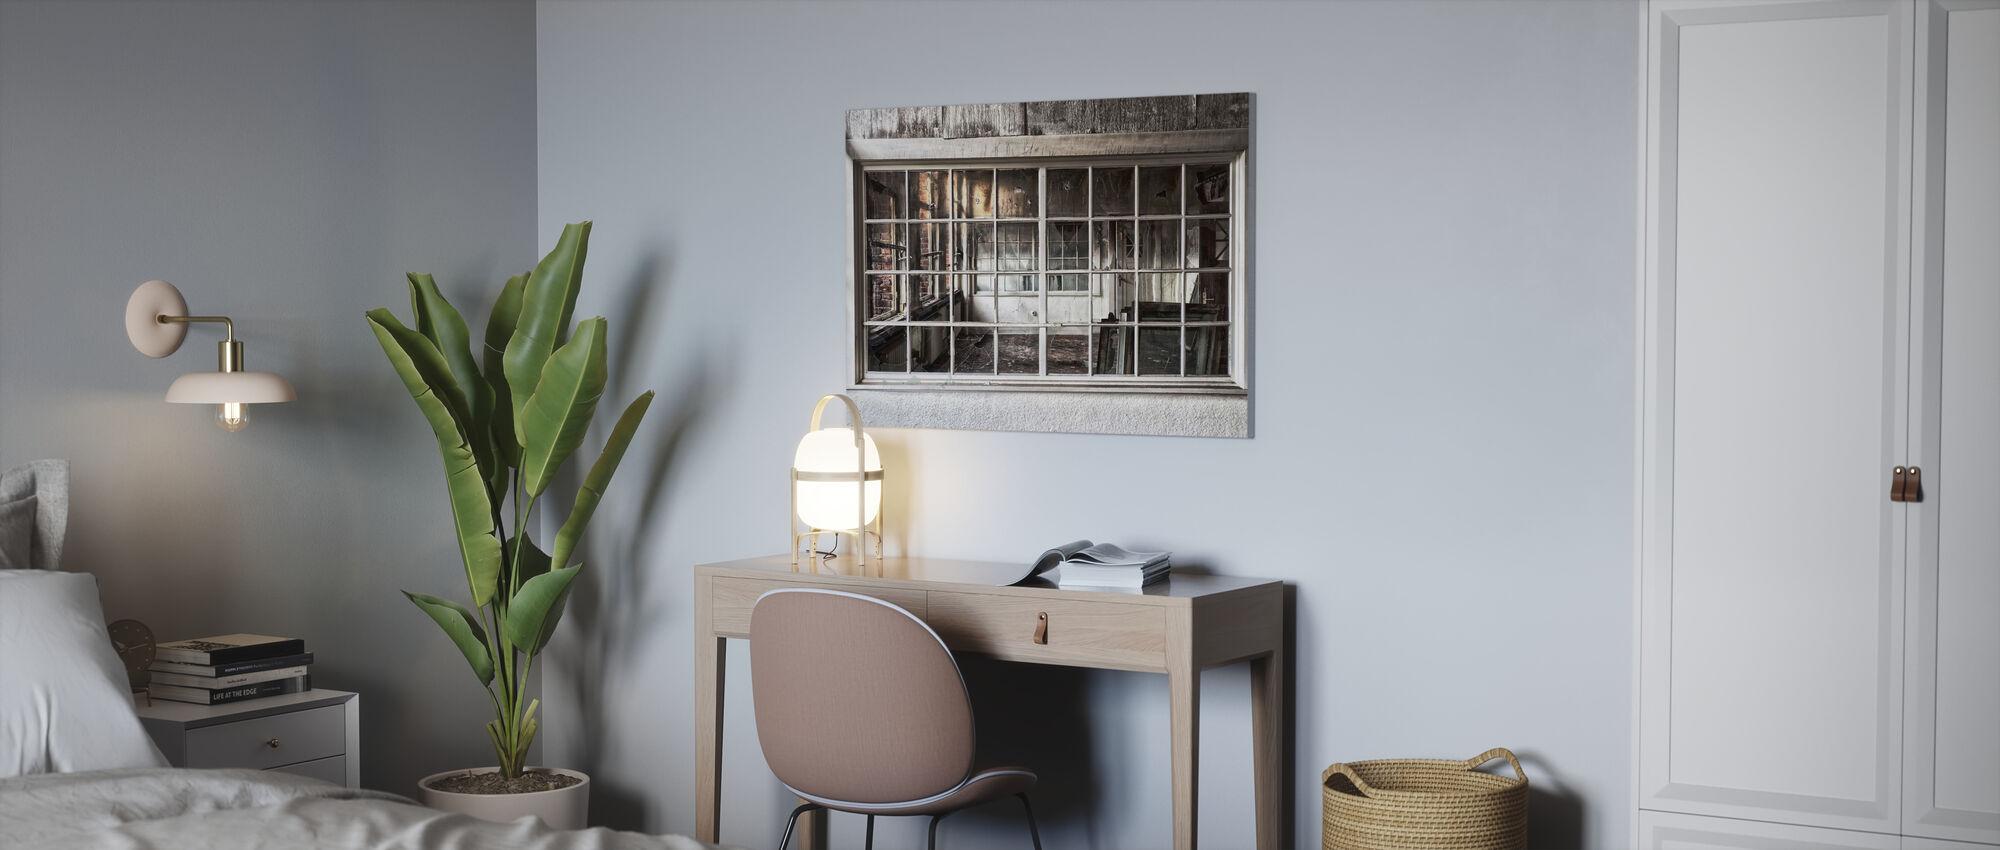 Zerbrochenes altes Fenster - Leinwandbild - Büro